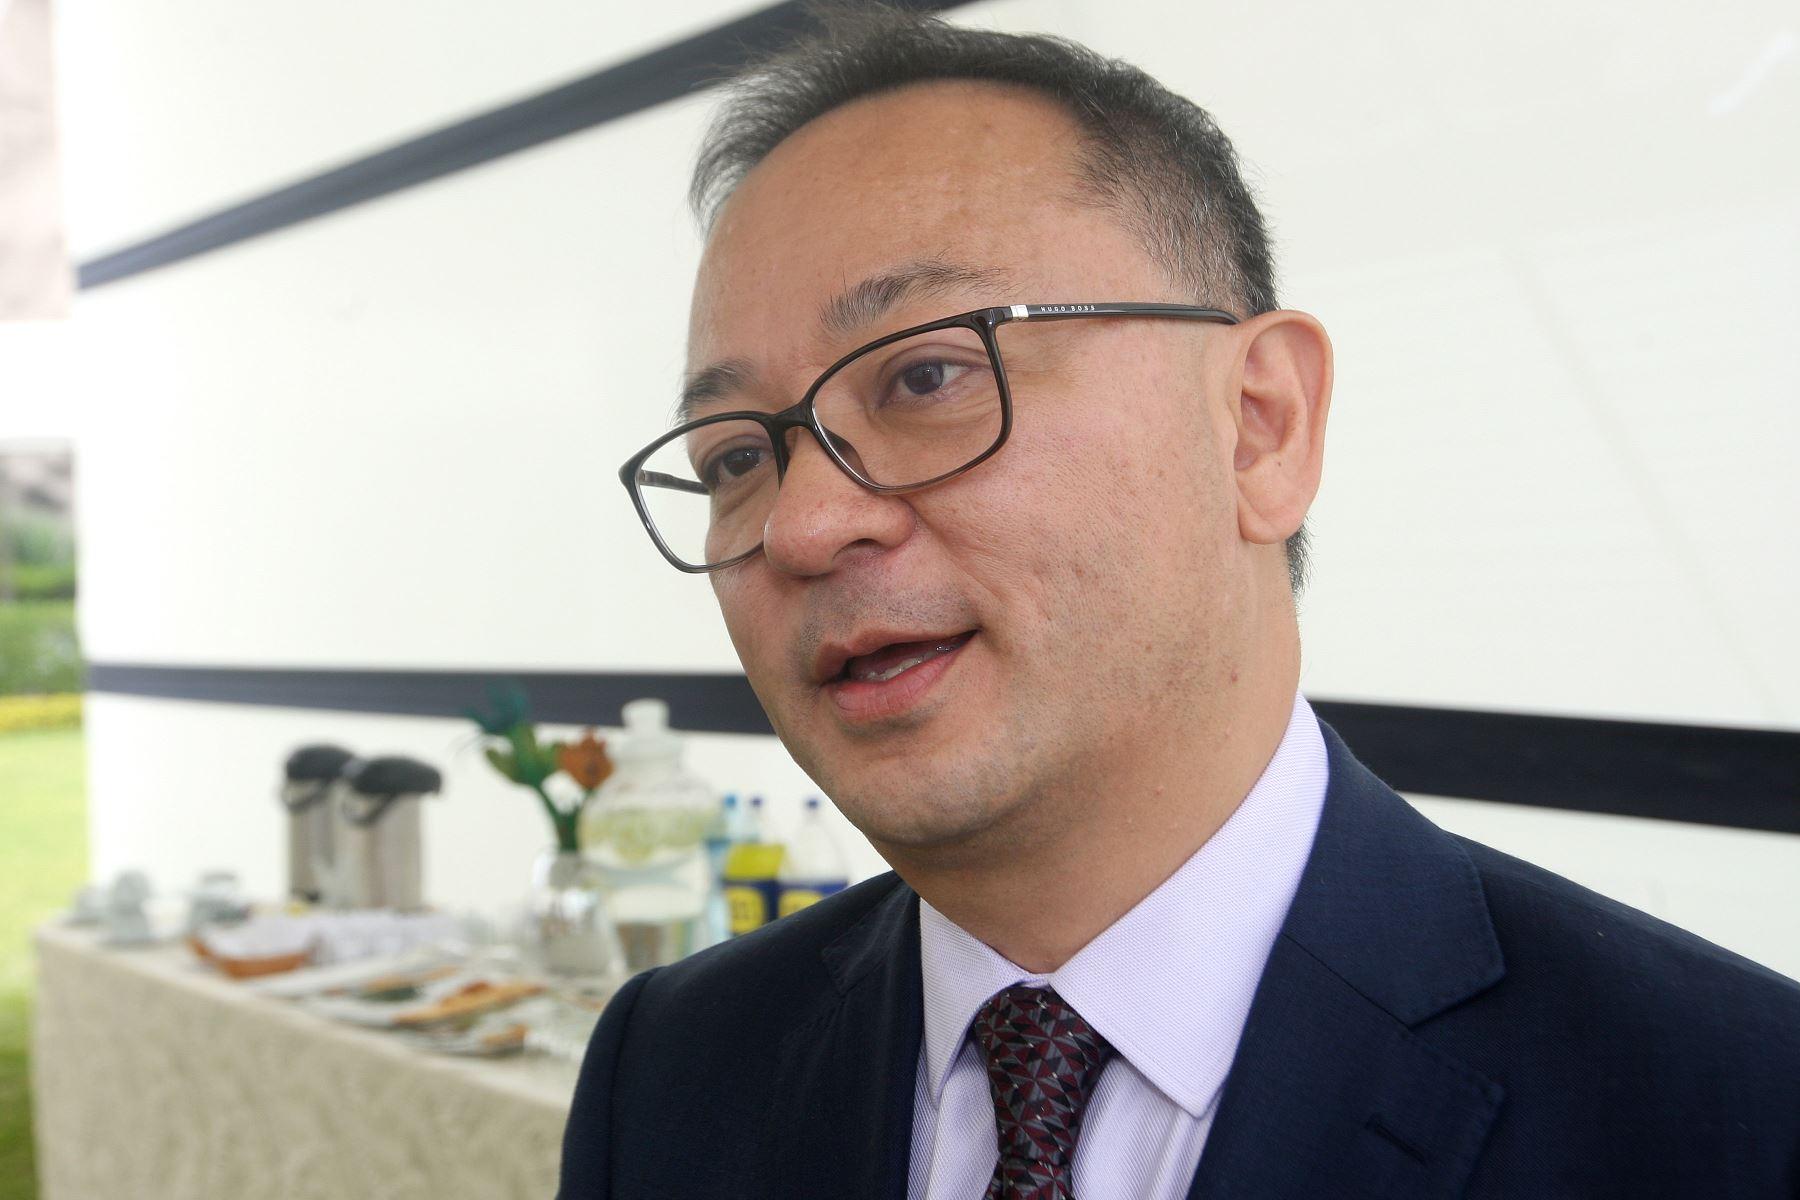 Gobierno se prepara para reducir beneficios tributarios — Sunat